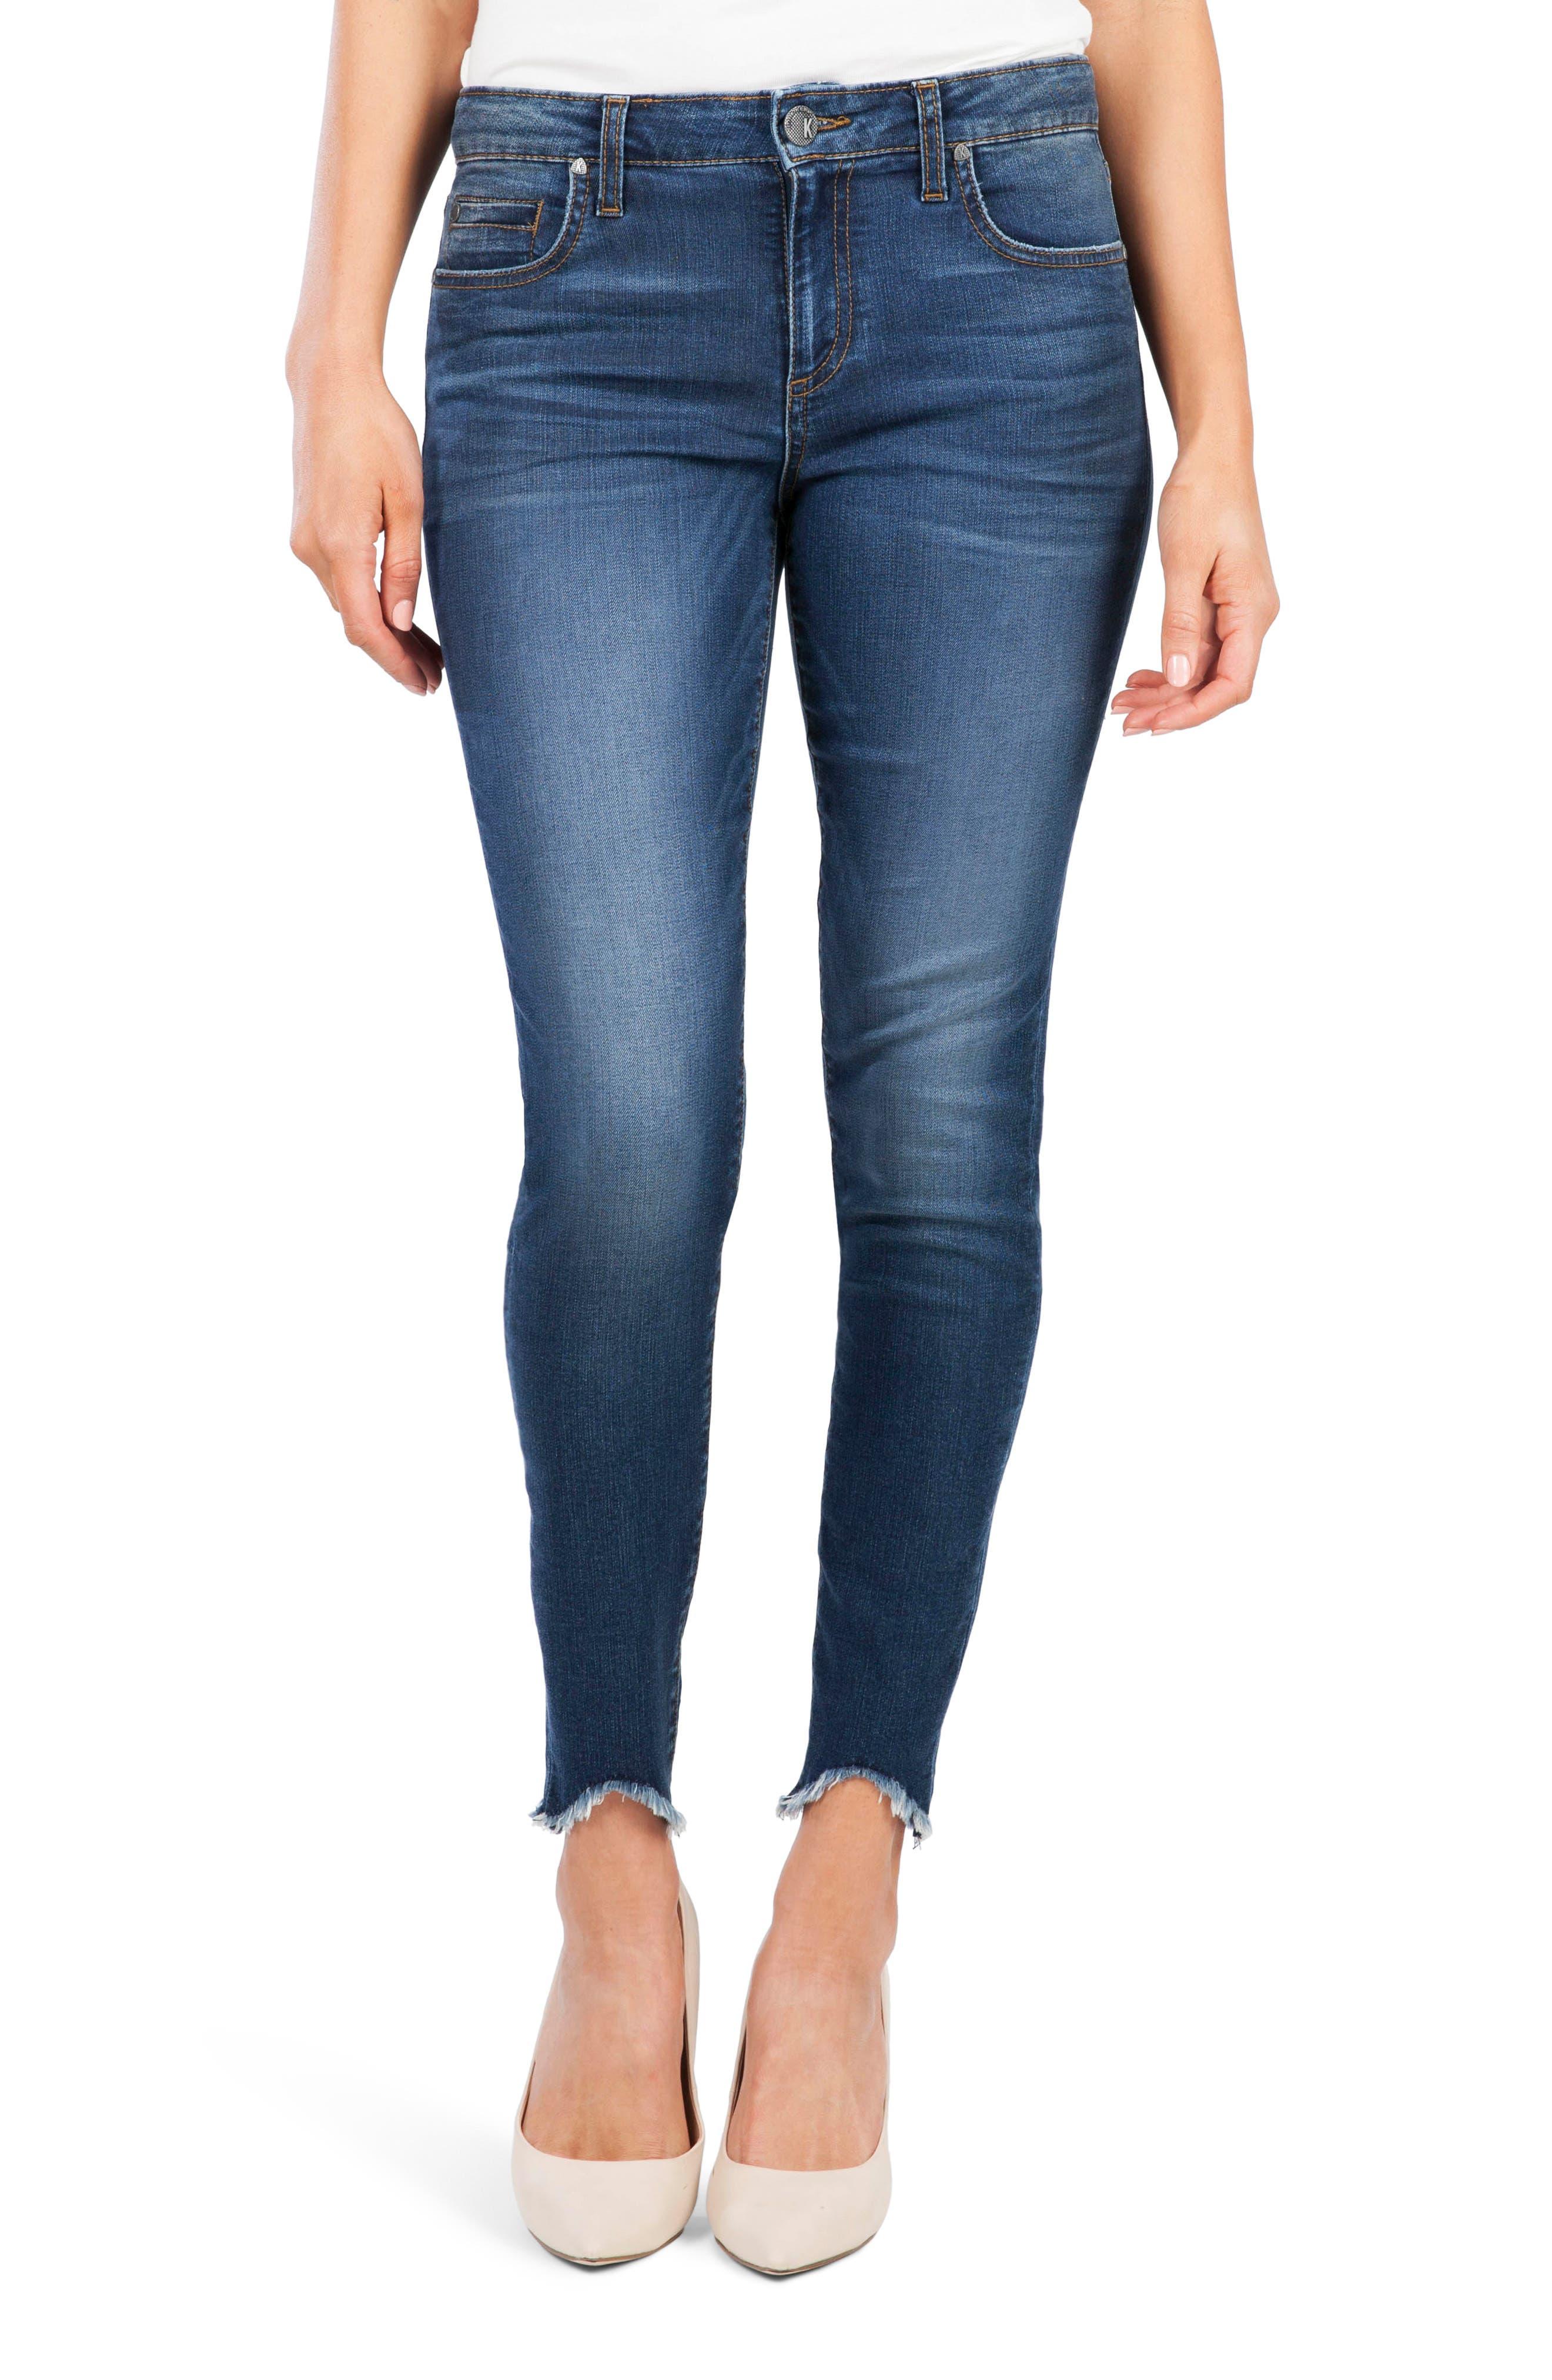 Kut From The Kloth Donna High Waist Frayed Hem Skinny Jeans, Blue